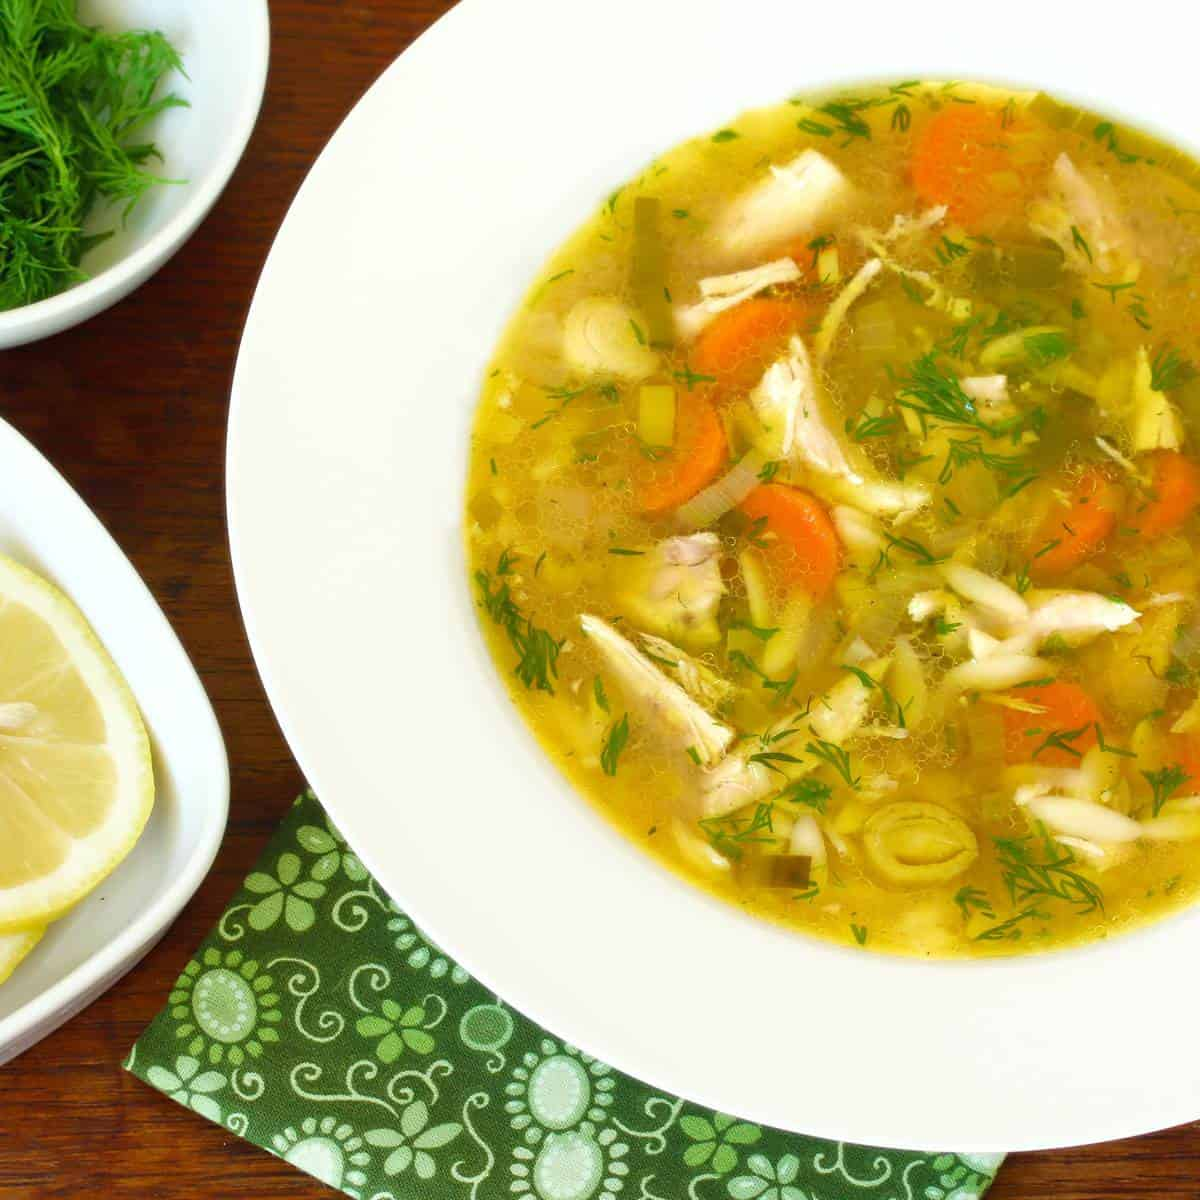 chicken orzo soup recipe lemon dill herbs slow cooker